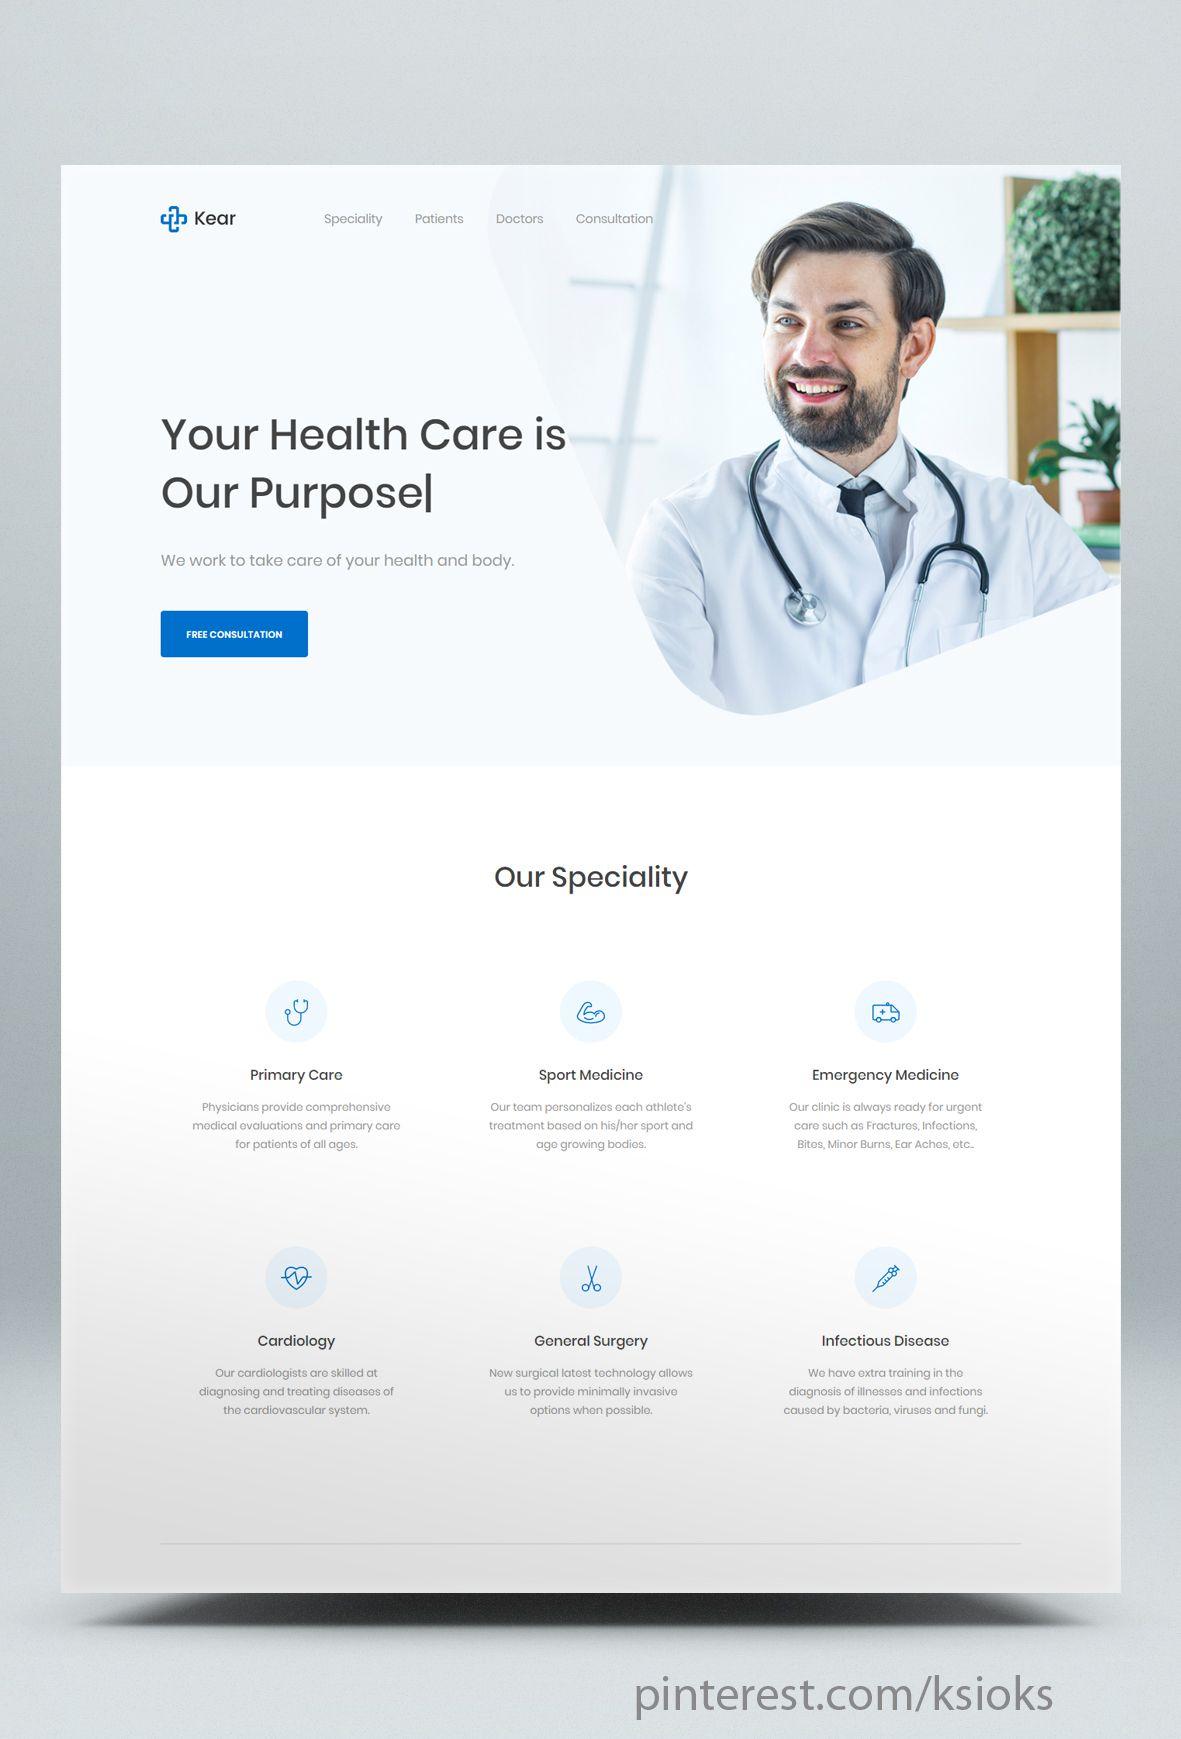 Medical Healthcare Landing Page Html Template Clean And Modern Medical Html5 Template It Can Be Us Medical Website Design Medical Design Healthcare Website